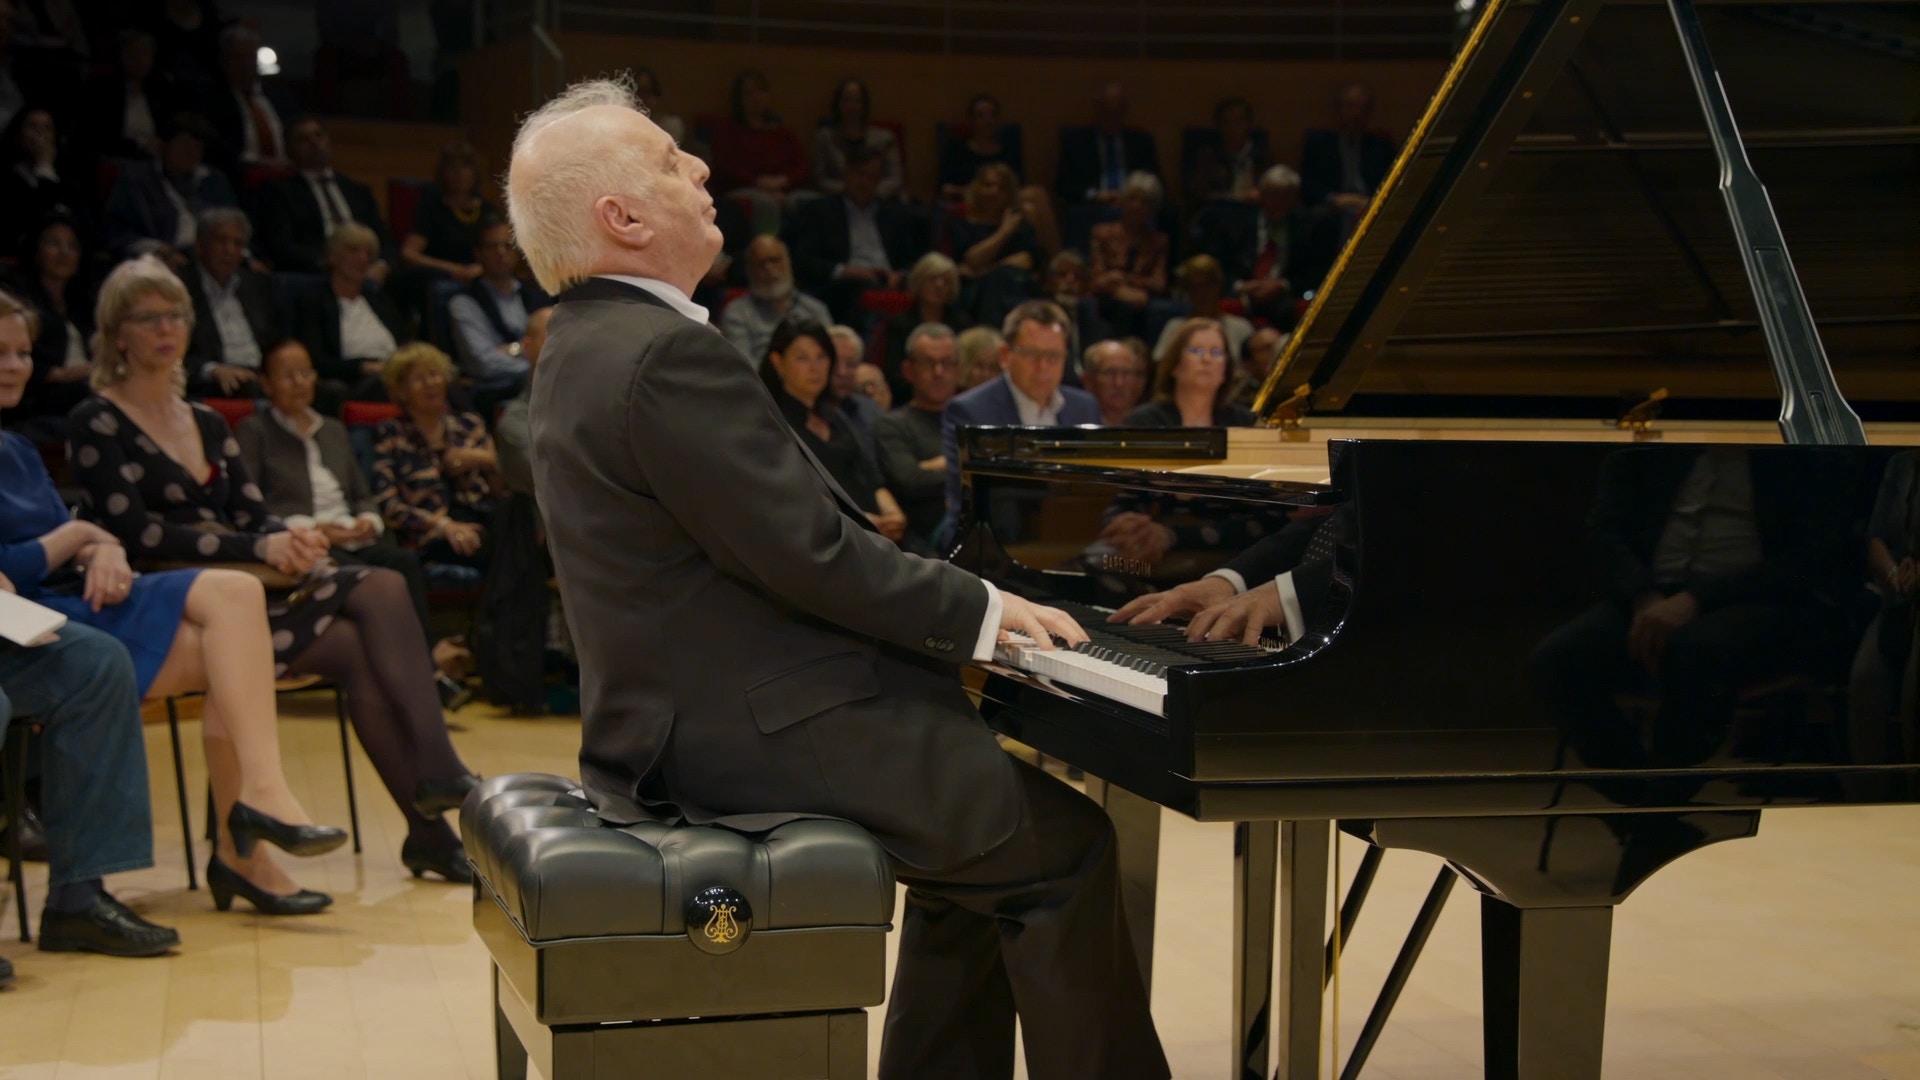 Concert Daniel Barenboim performs Schubert's Piano Sonatas ...